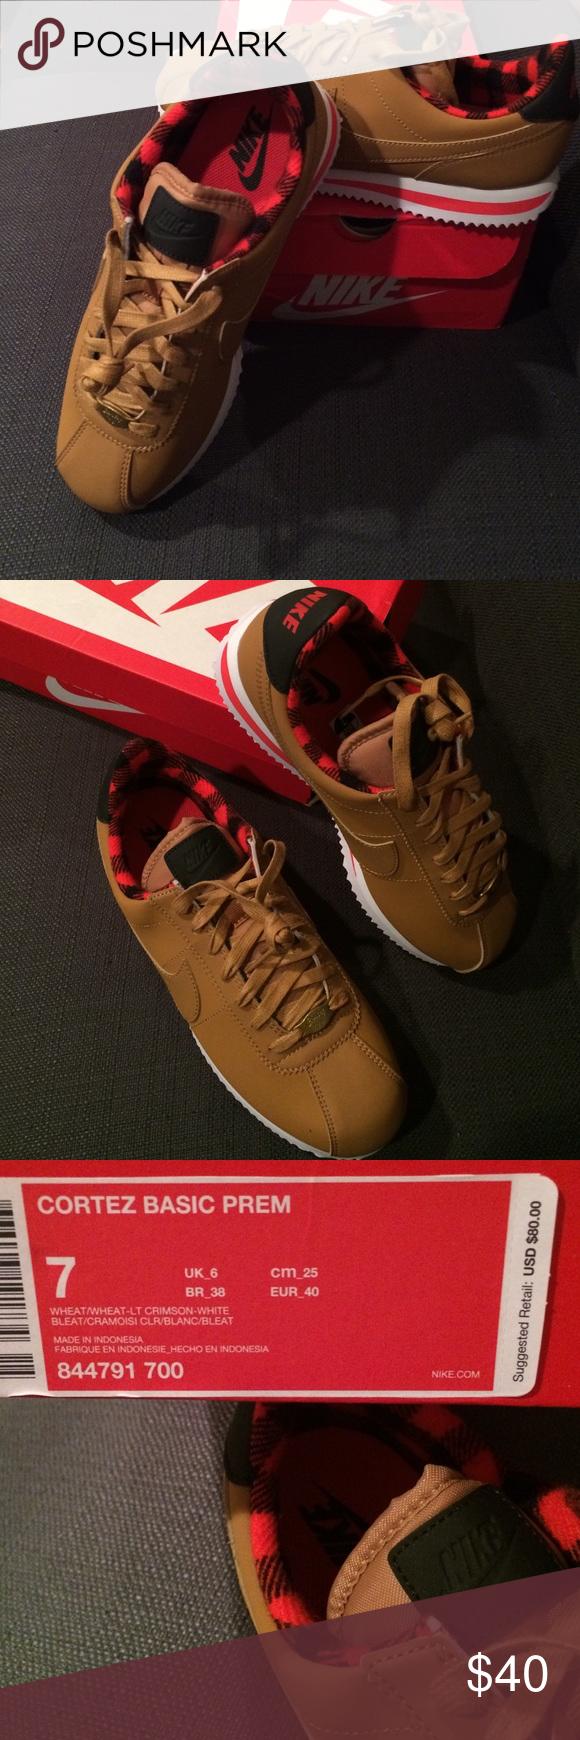 new products 8a218 b8394 NWT Nike Cortez Basic Wheat women's size 9, men 5 NWT Nike ...